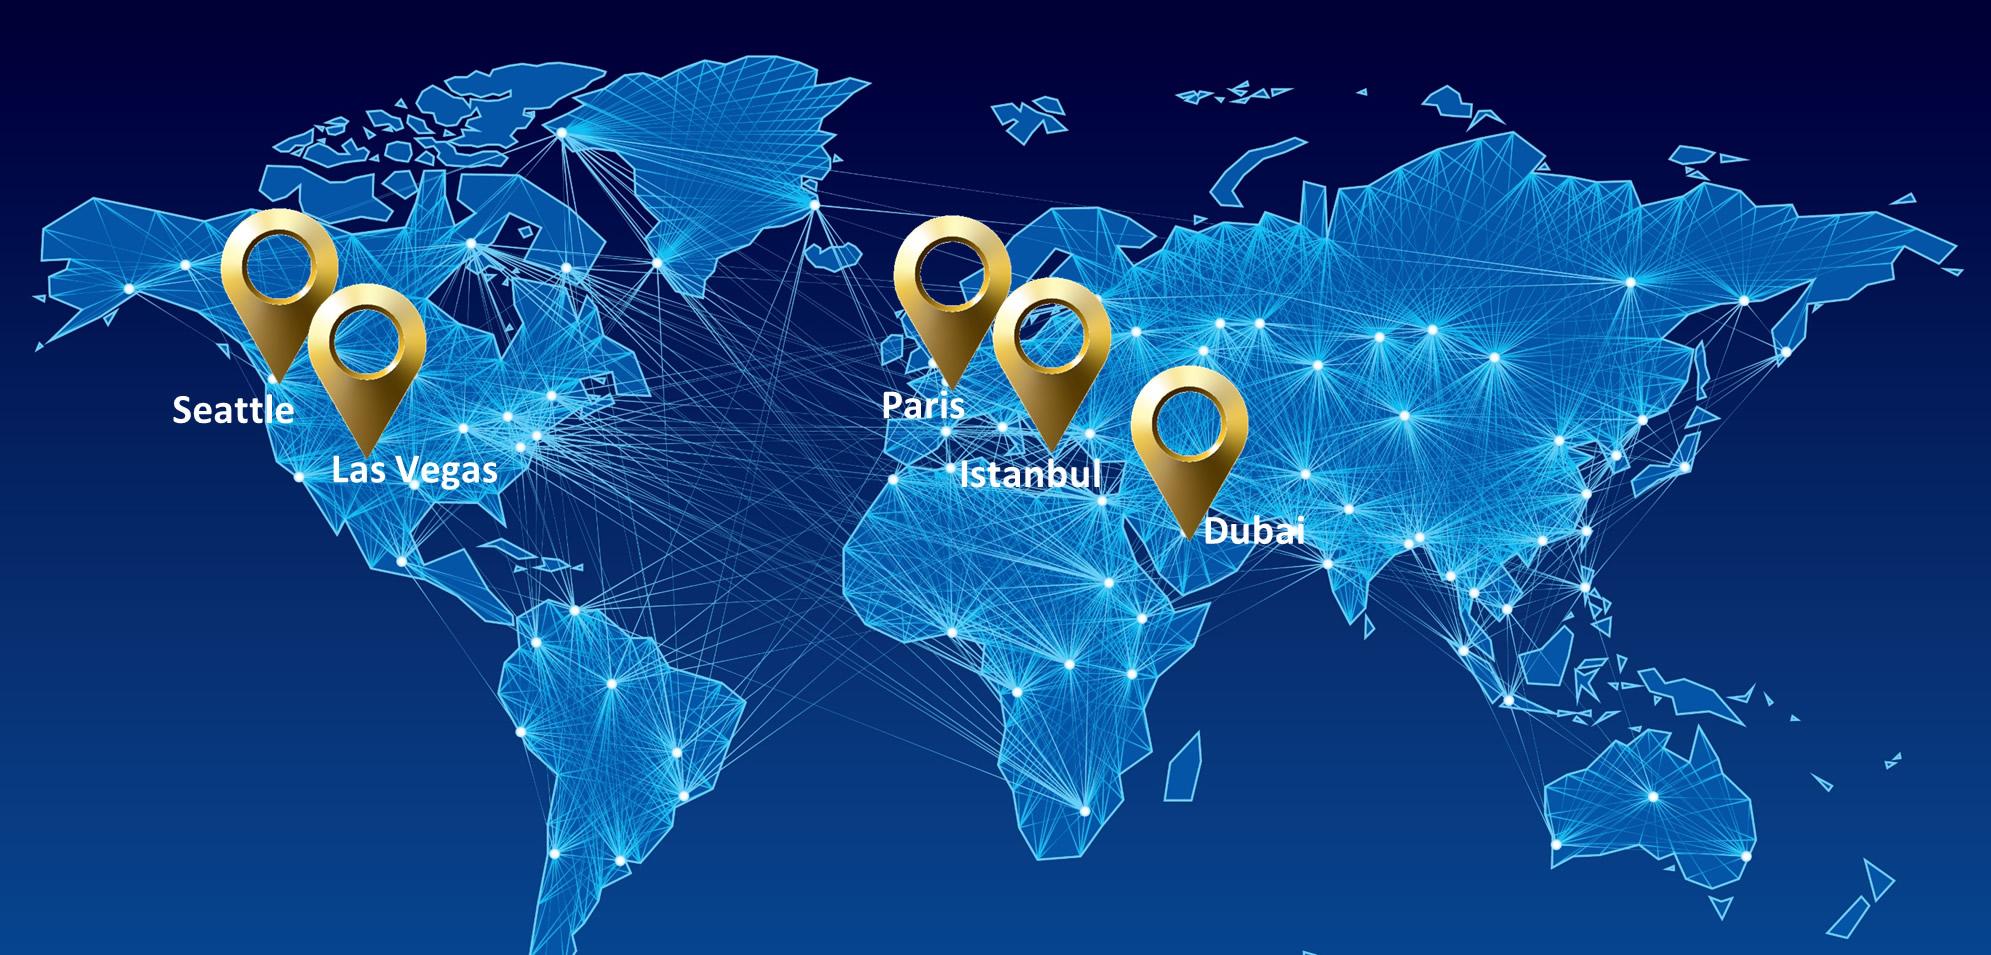 https://c-impact.com/wp-content/uploads/2020/07/international-network.jpg